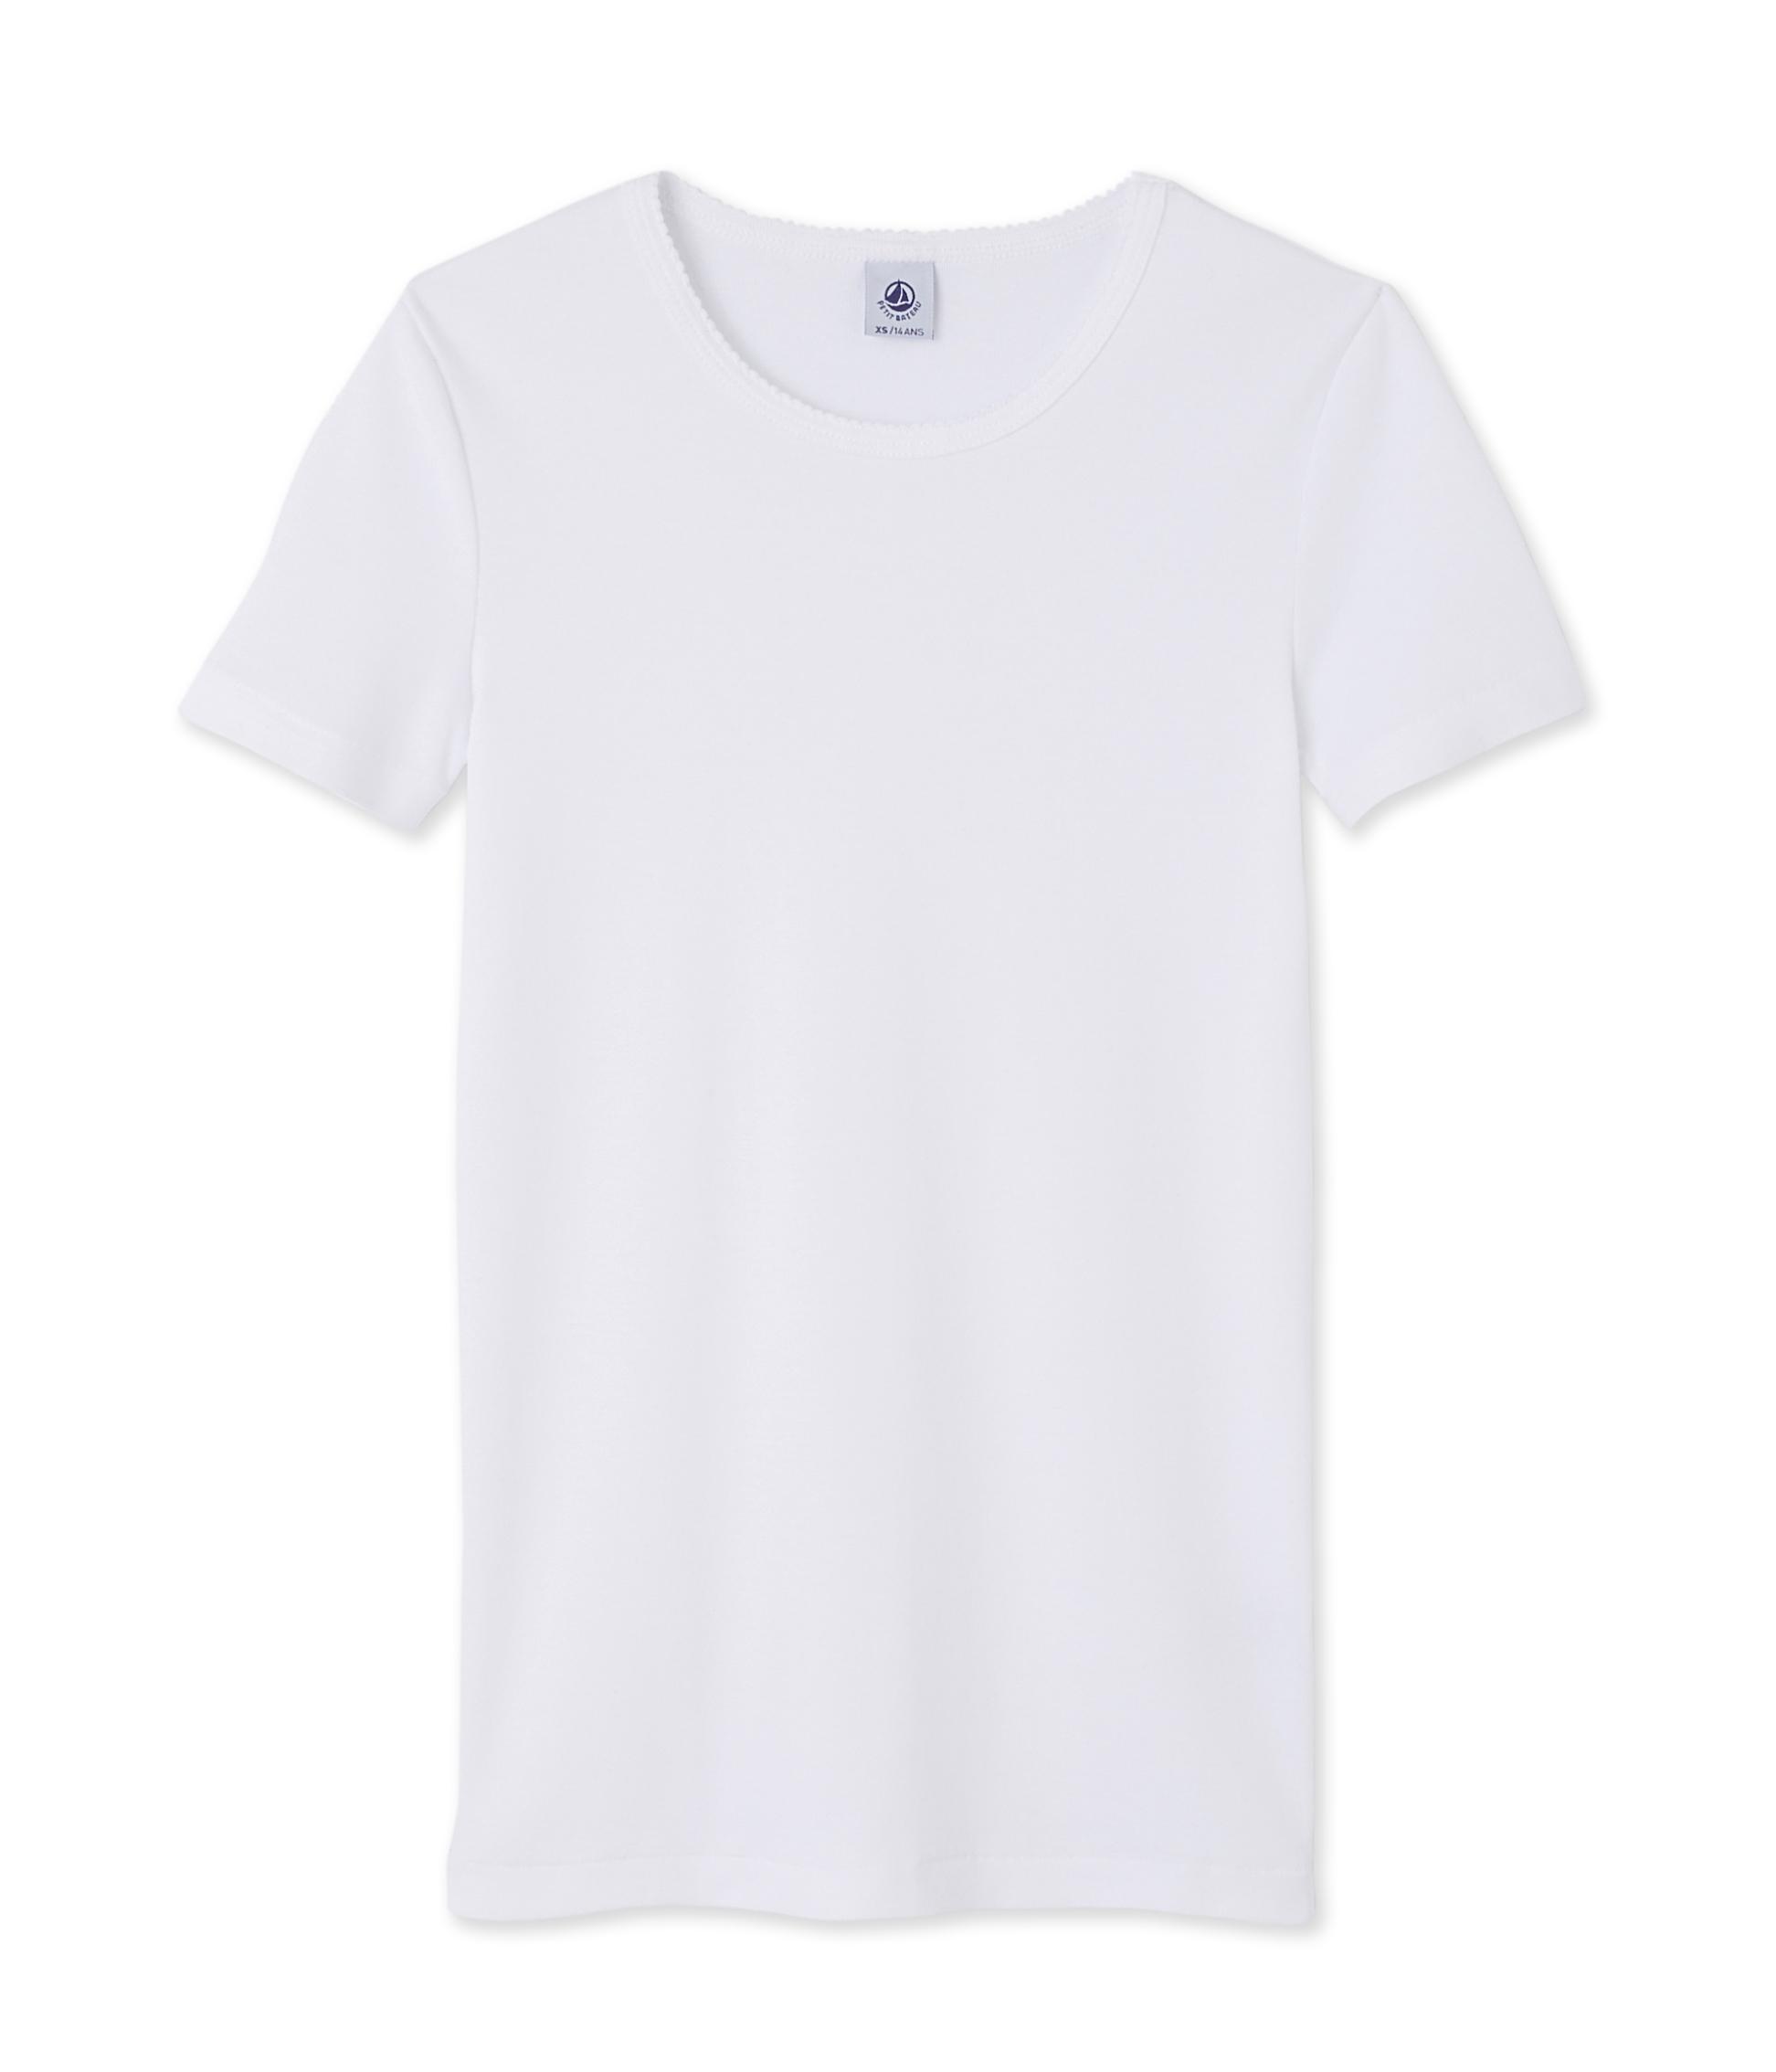 5267ade1 Women's short-sleeved plain t-shirt | Petit Bateau